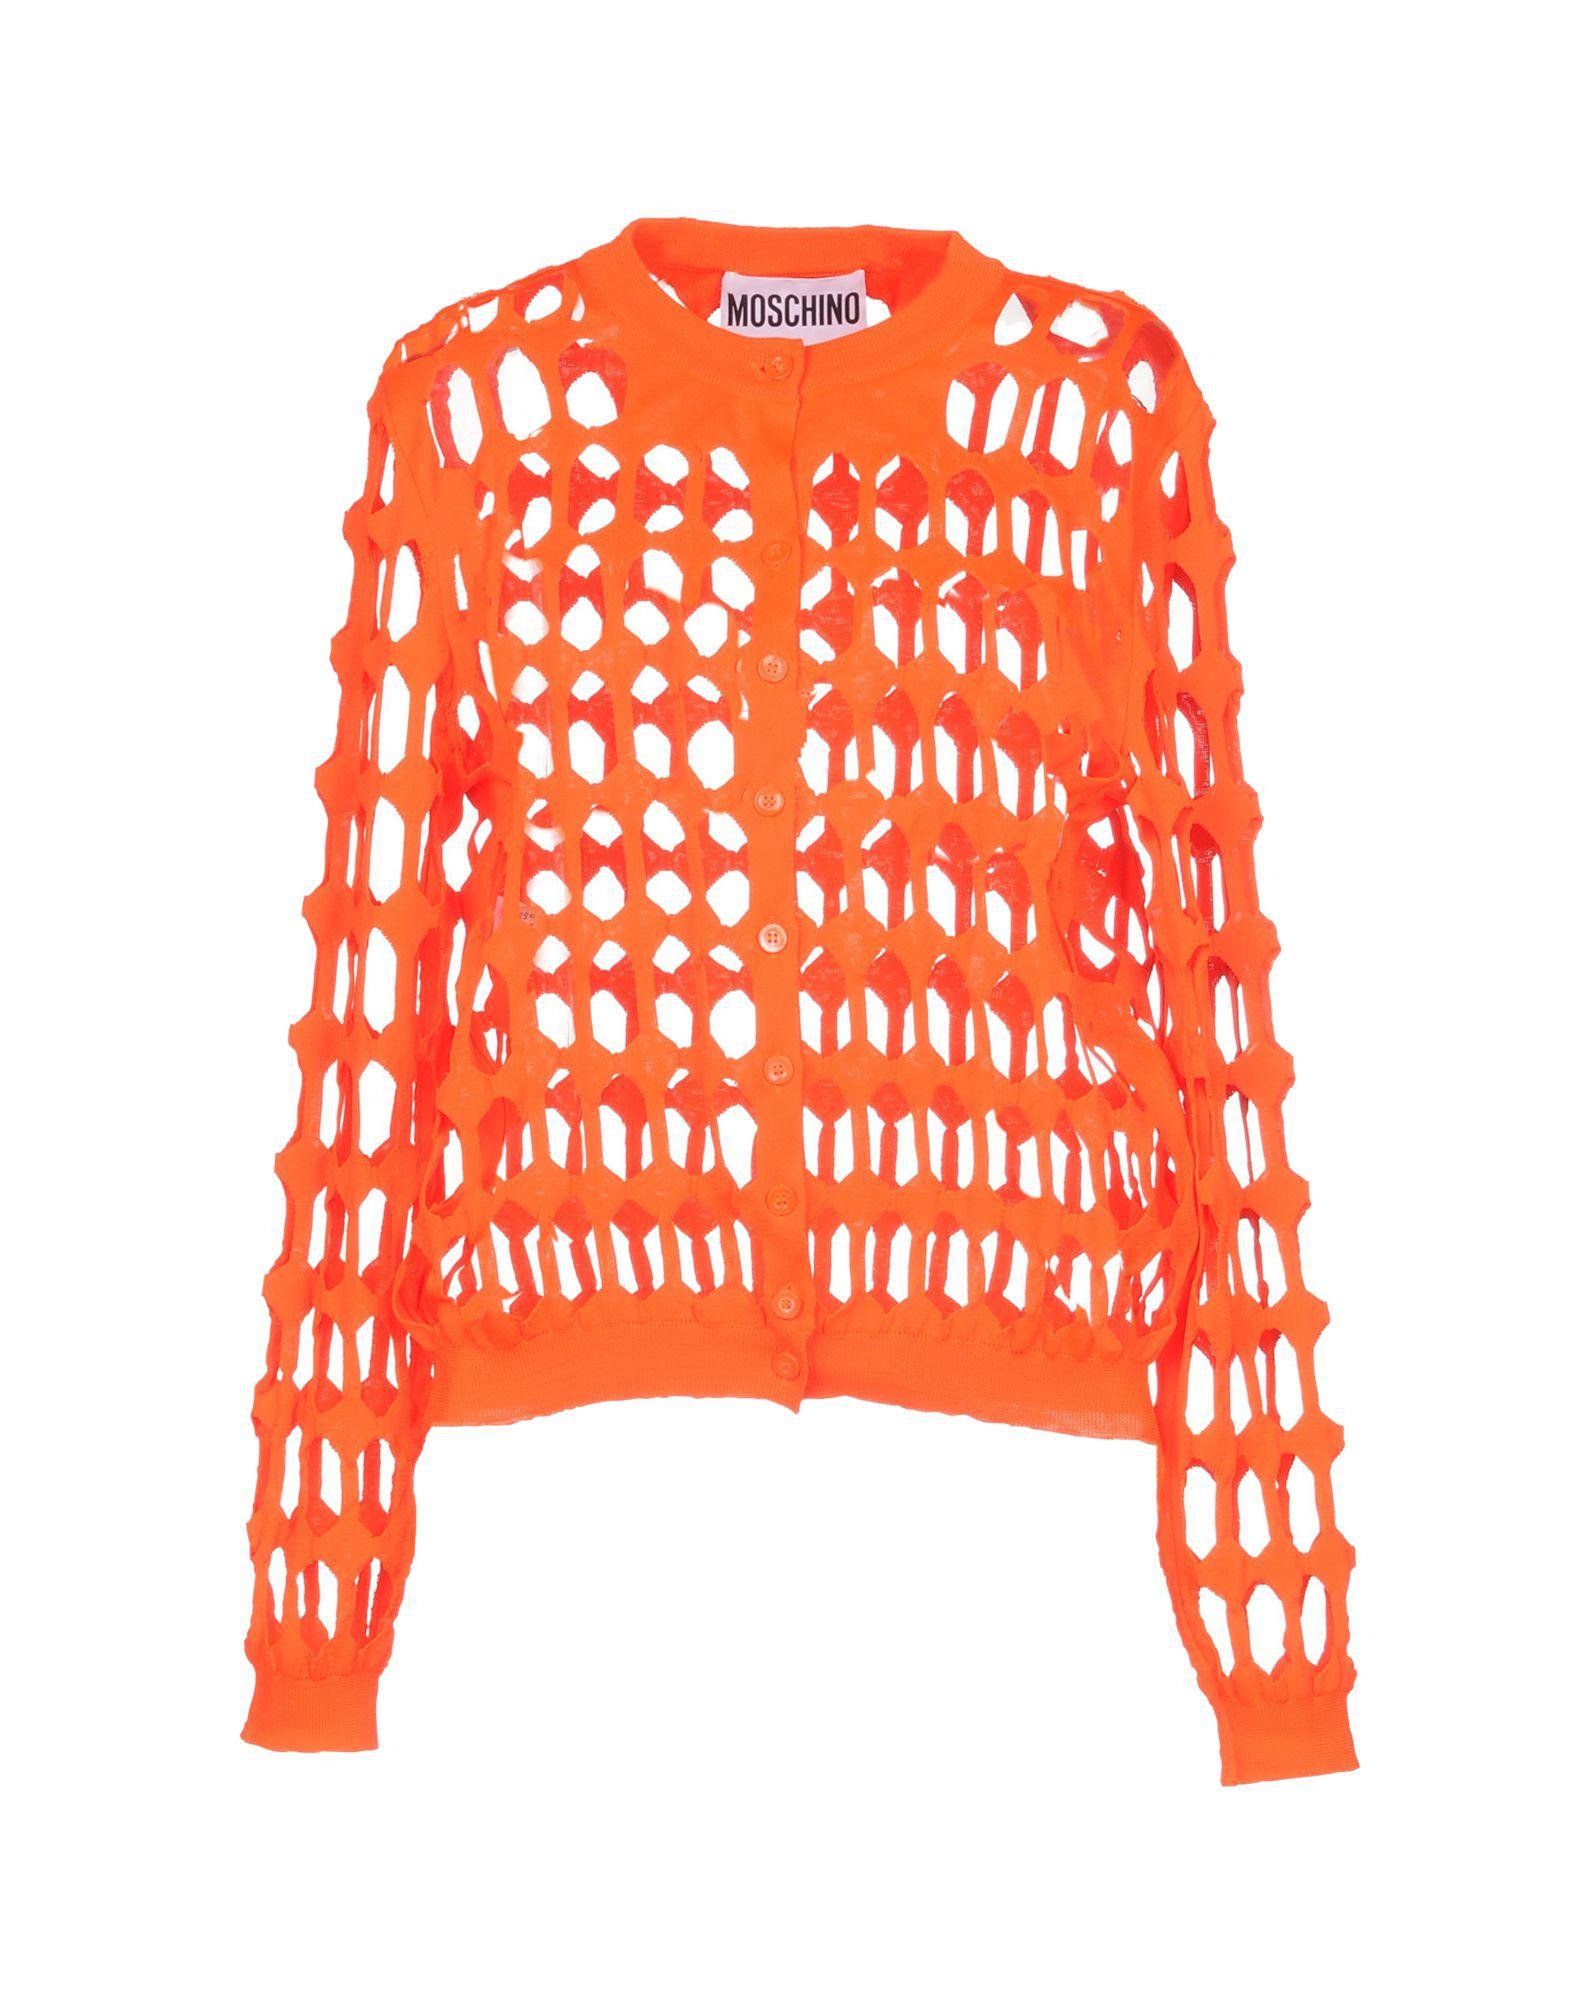 d482f50f3 Moschino Cardigan in Orange - Lyst